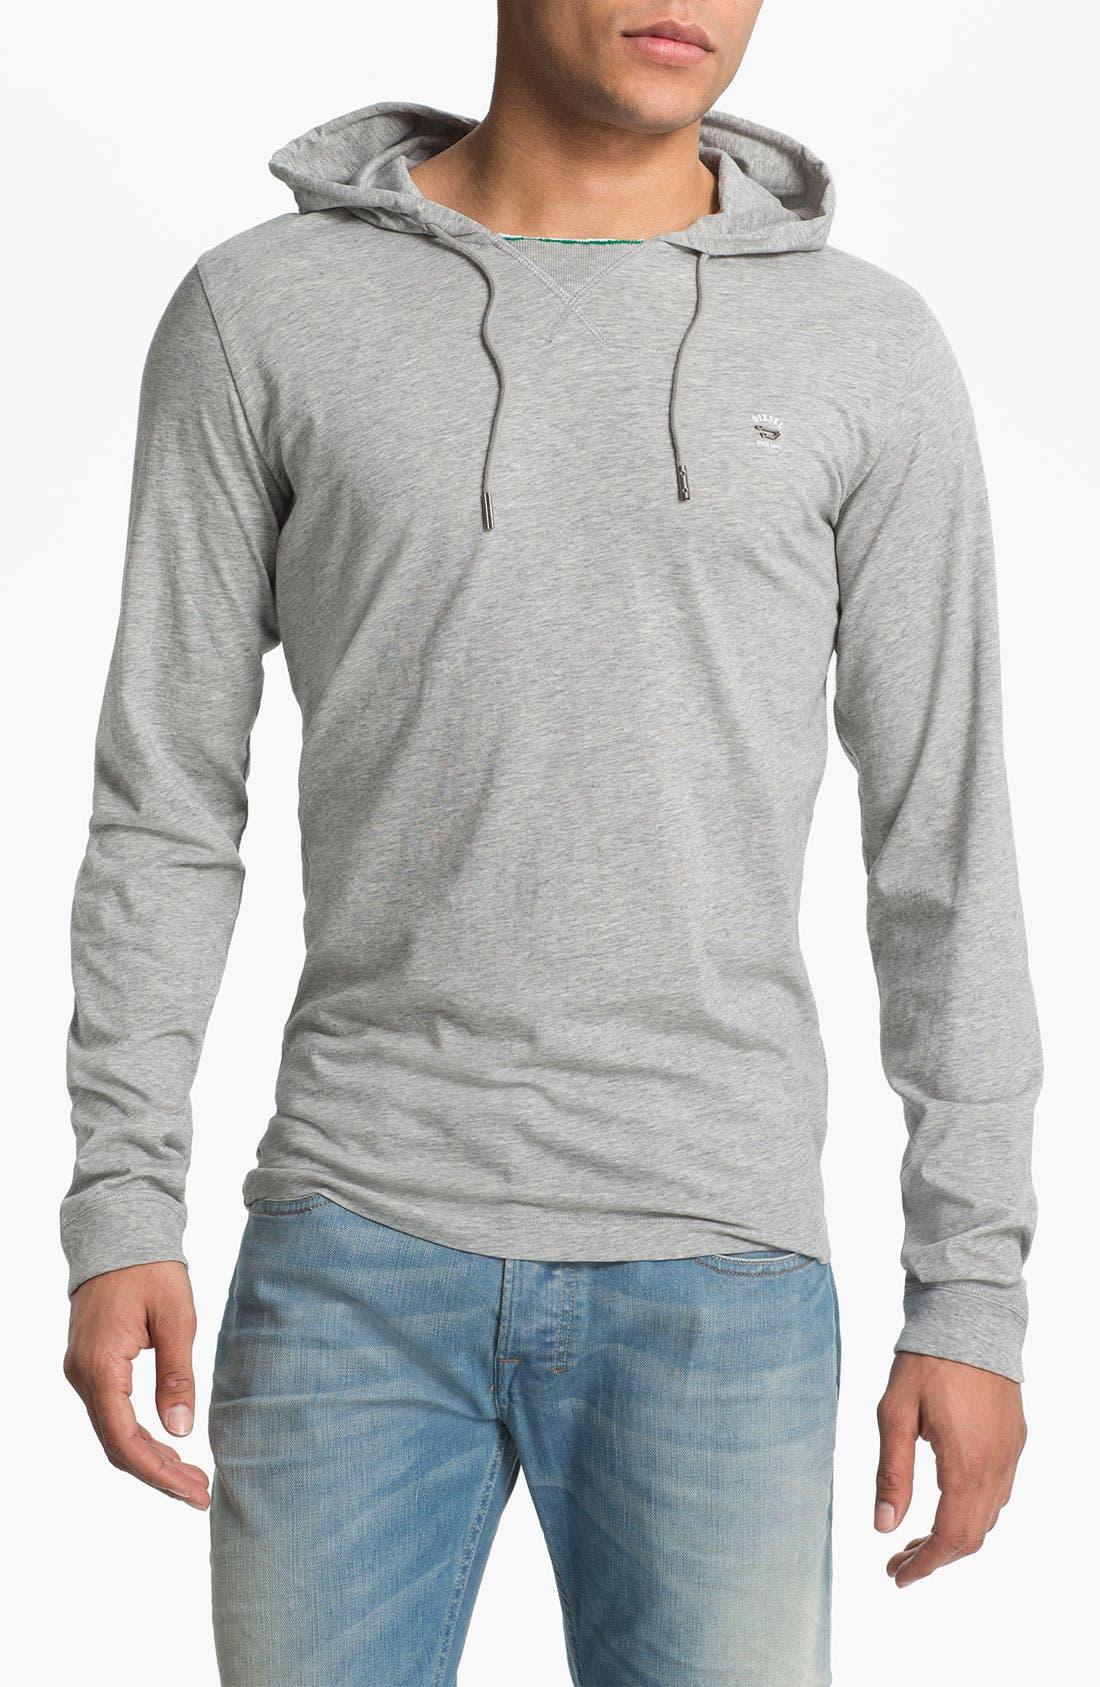 Main Image - DIESEL® 'T-Someone' Hooded Long Sleeve T-Shirt